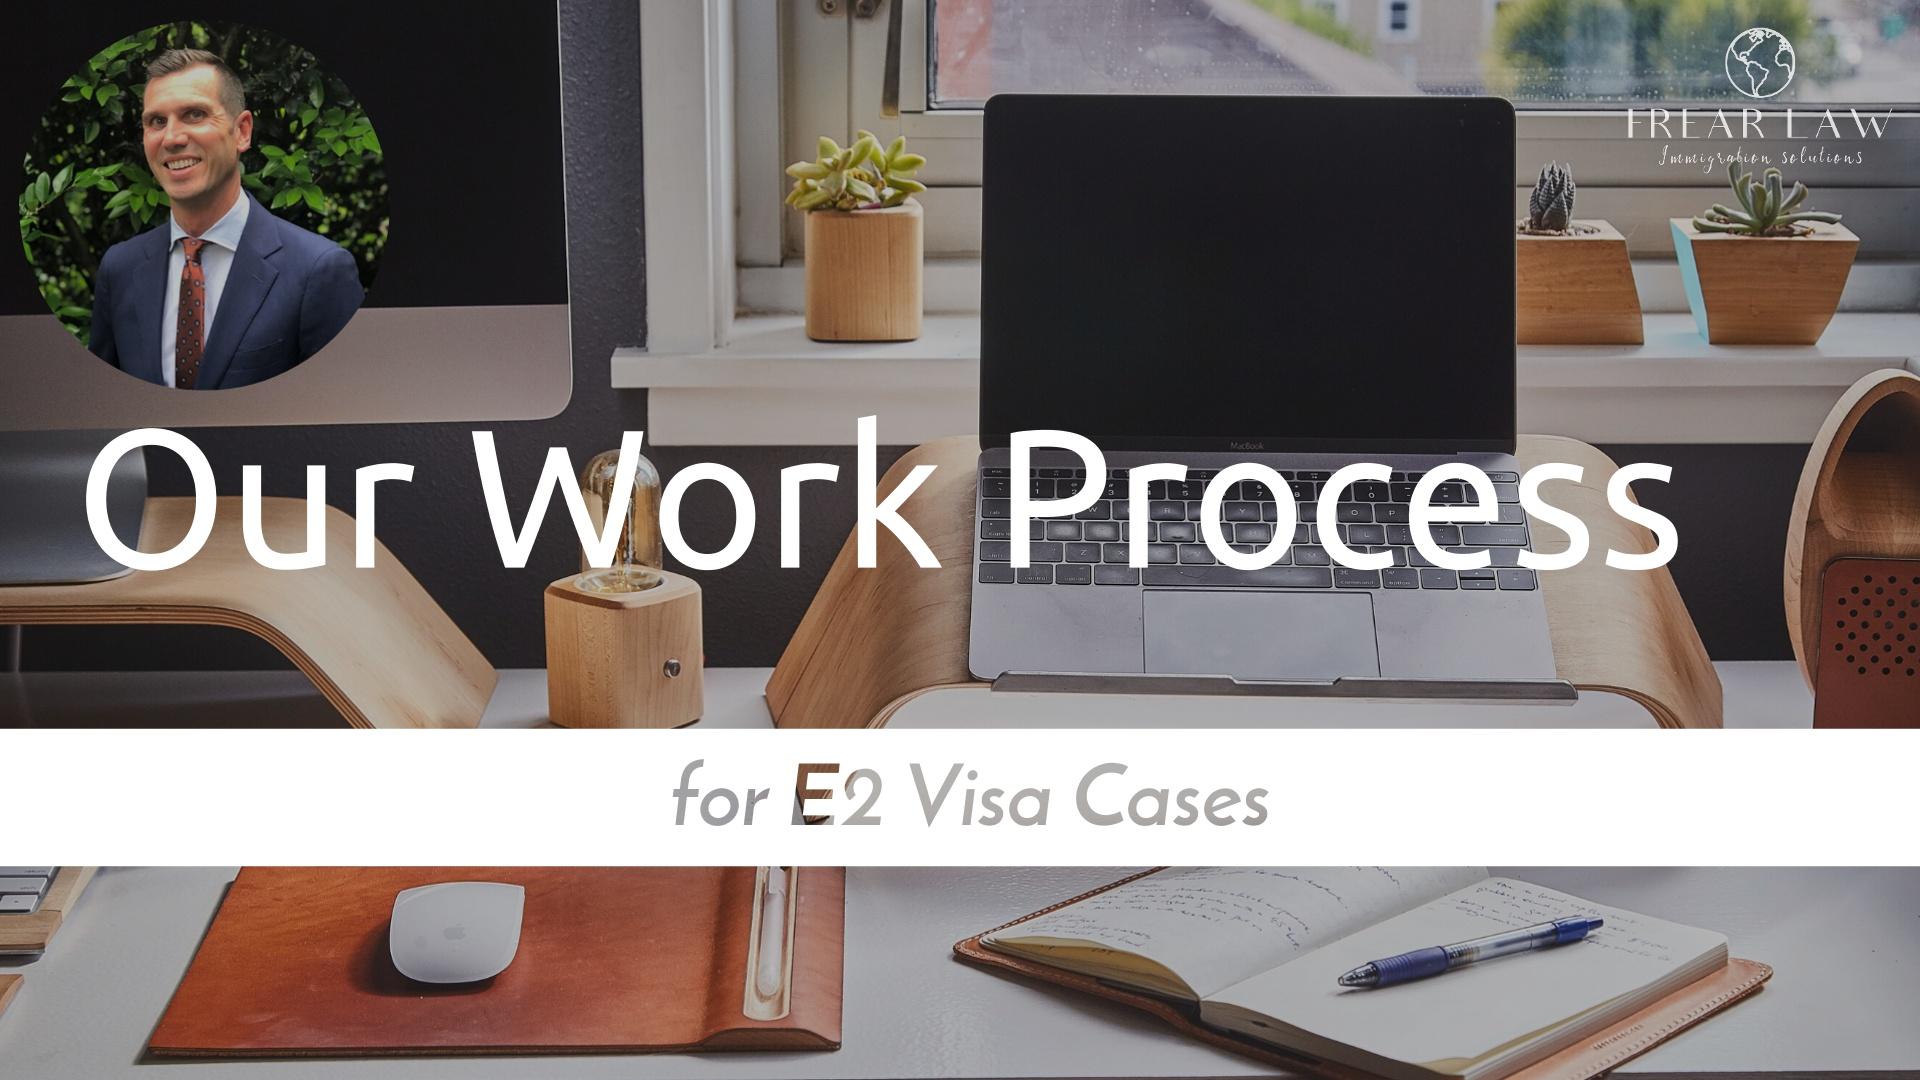 Work Process for E2 Visa Cases